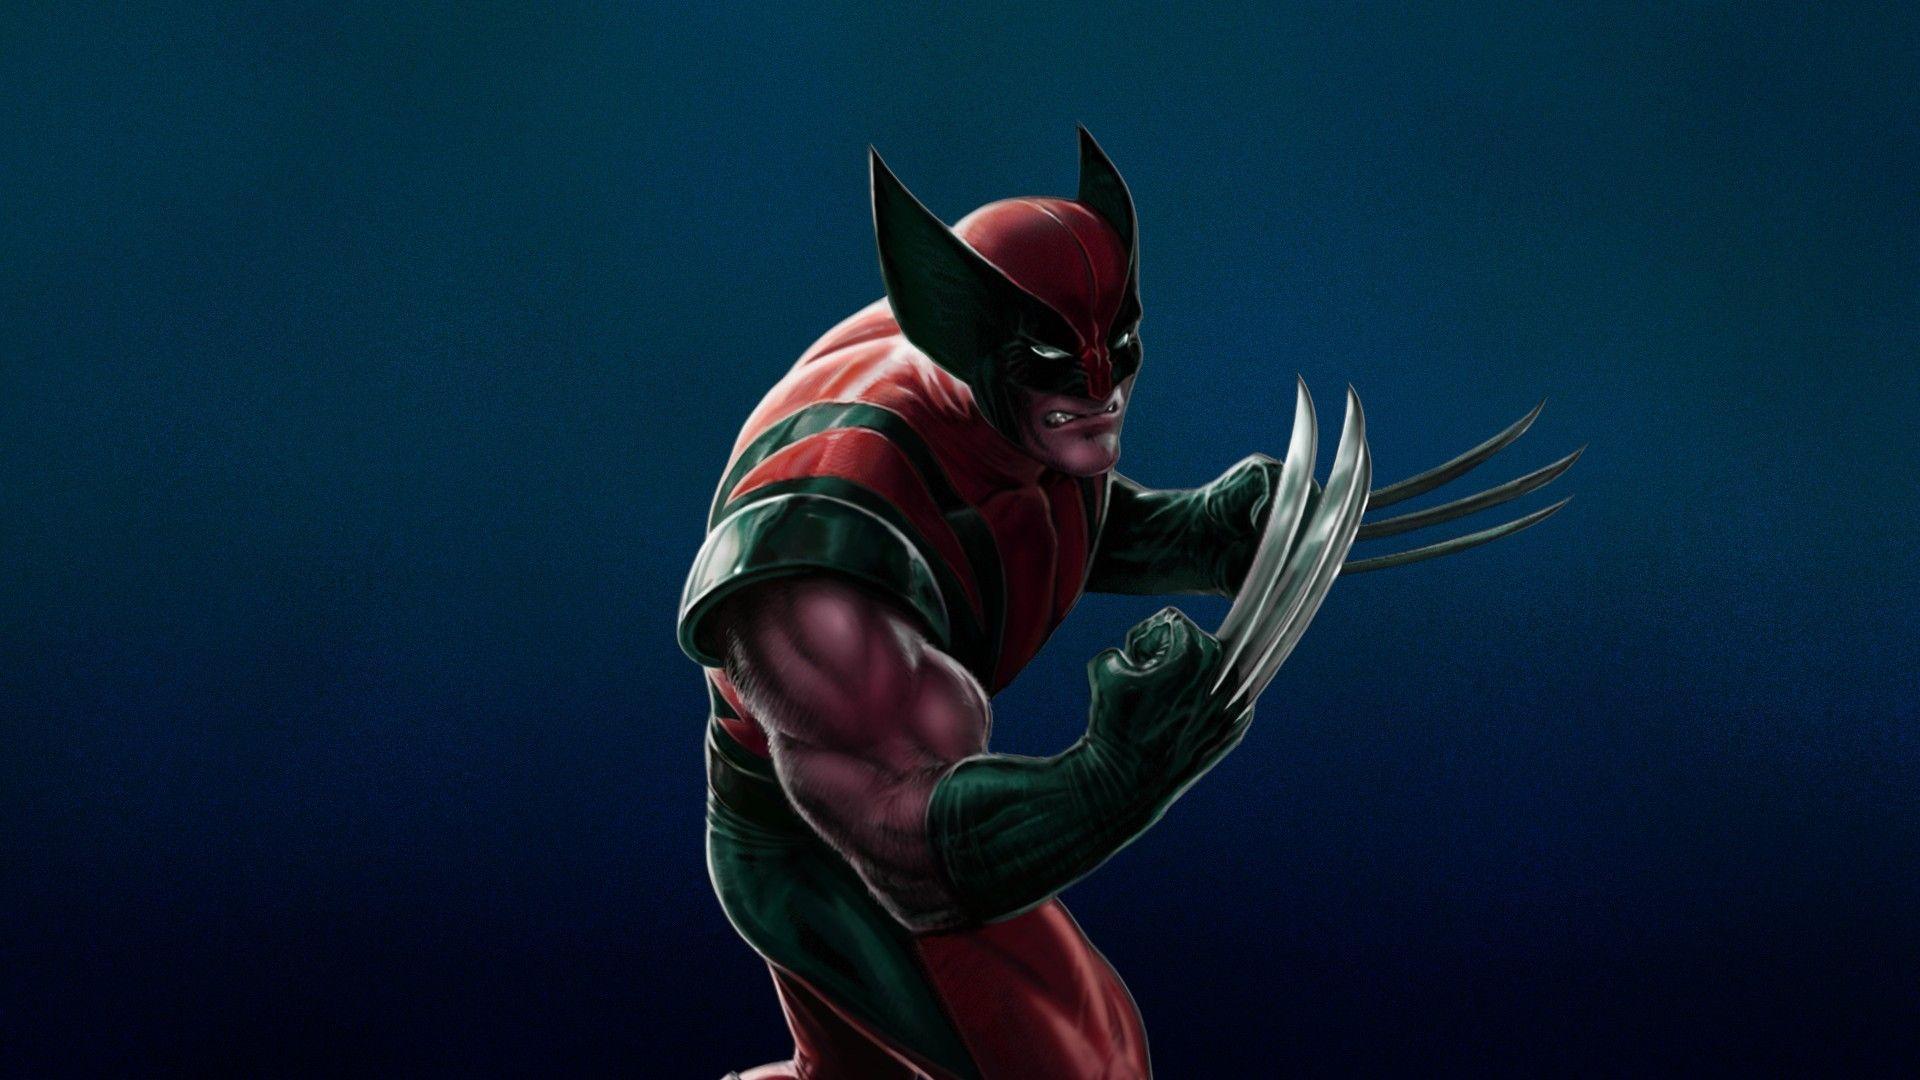 Logan Wolverine Cartoon Wallpaper